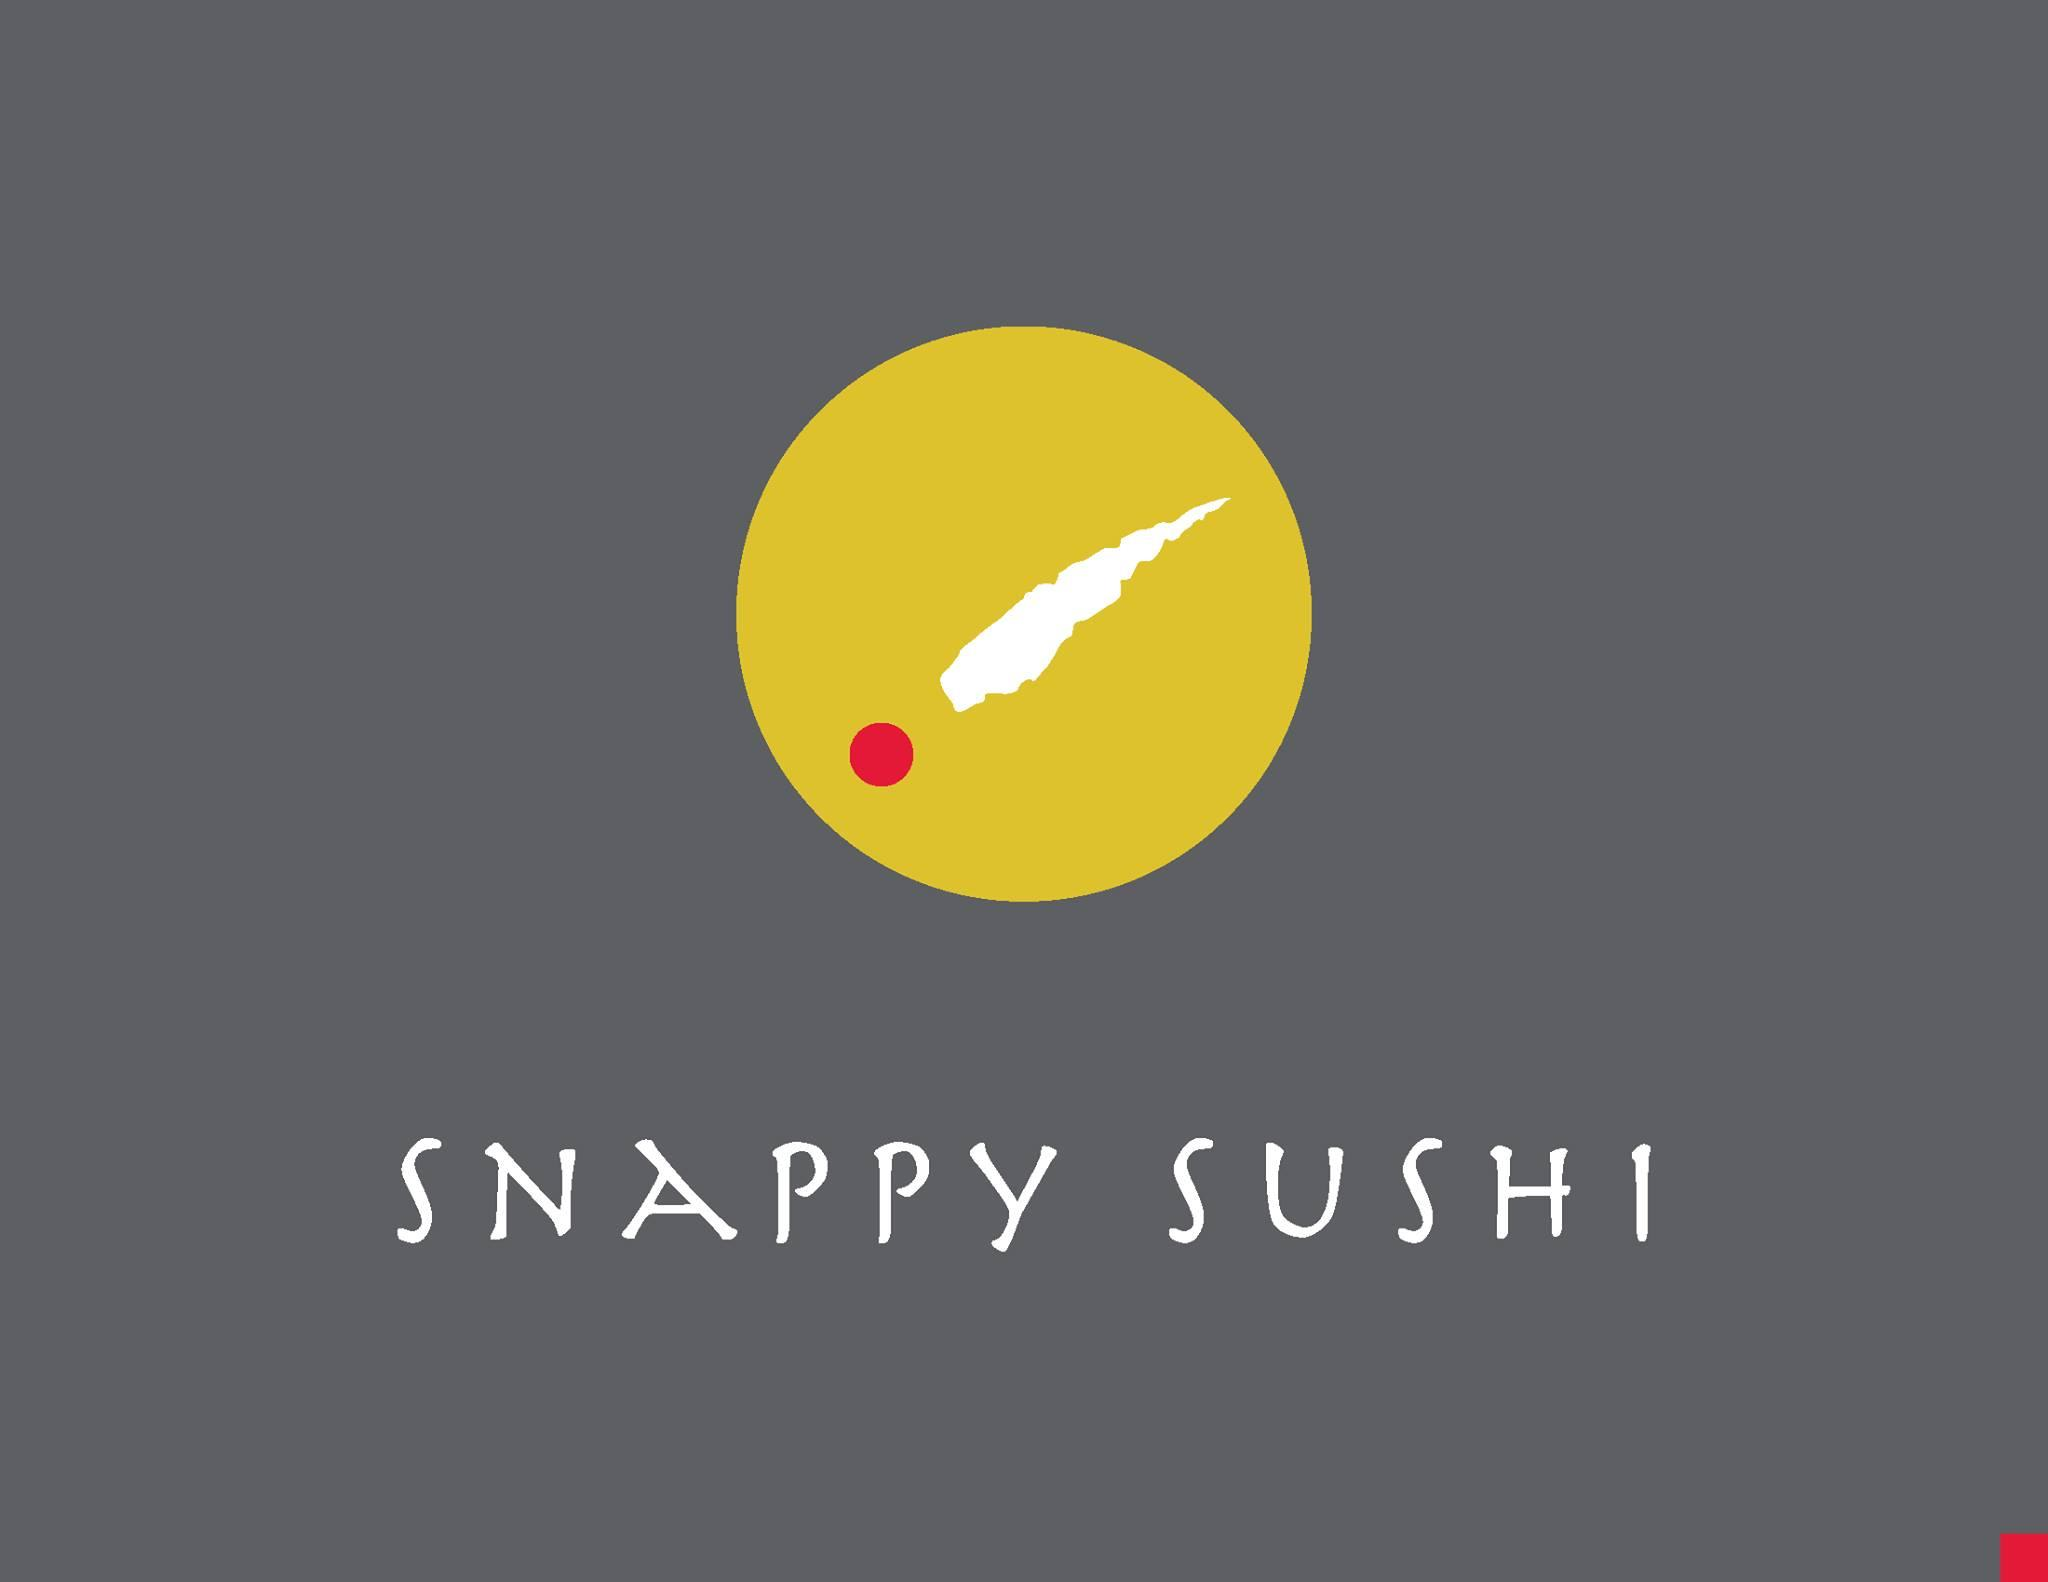 Photo at Snappy Sushi